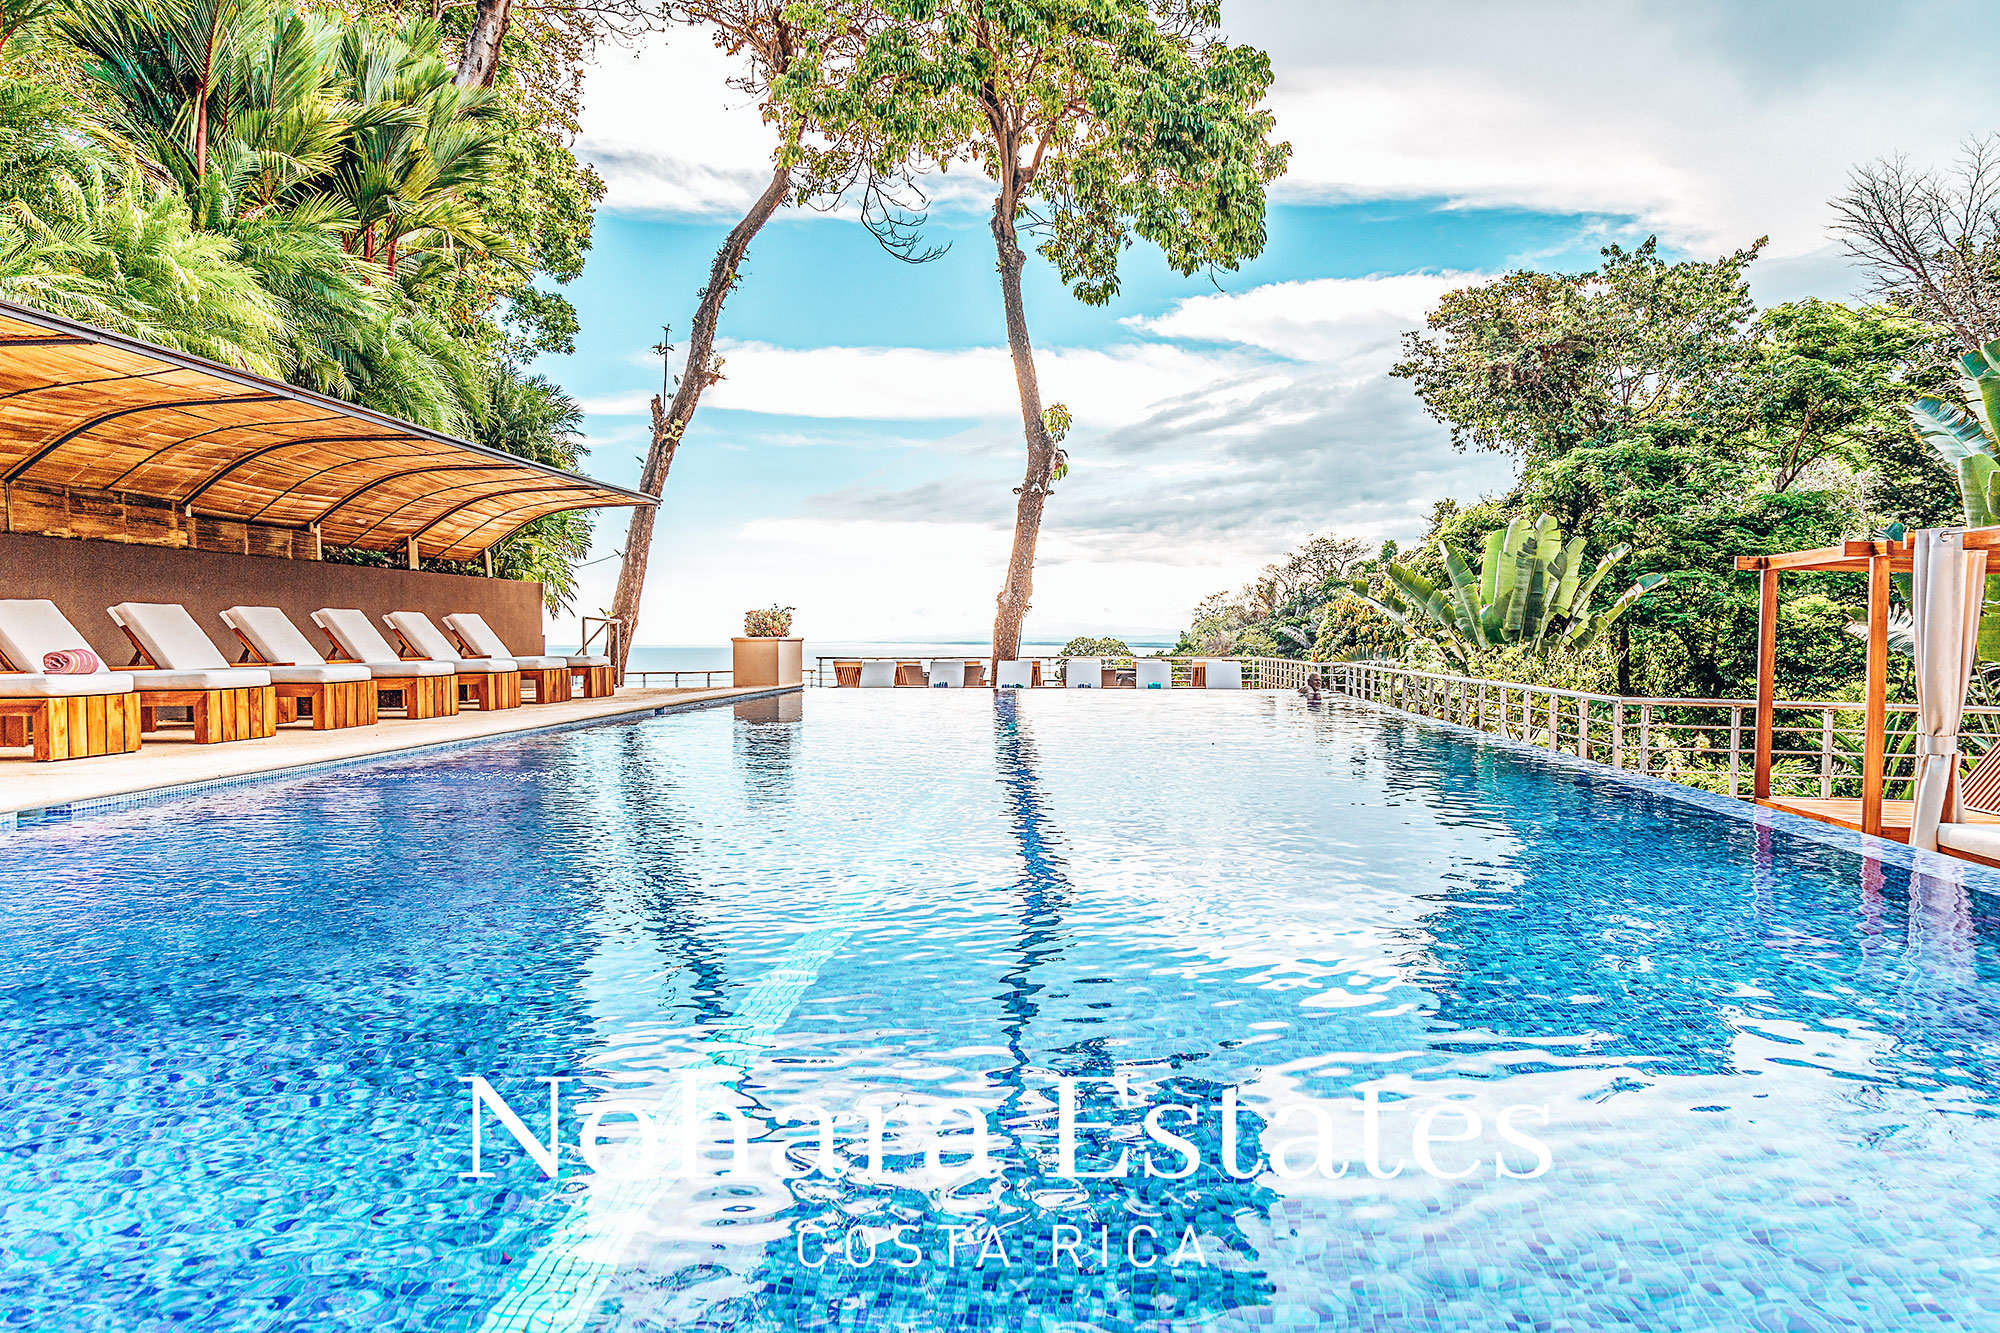 Nohara Estates Costa Rica 125 Apartment Quepos Los Altos 67